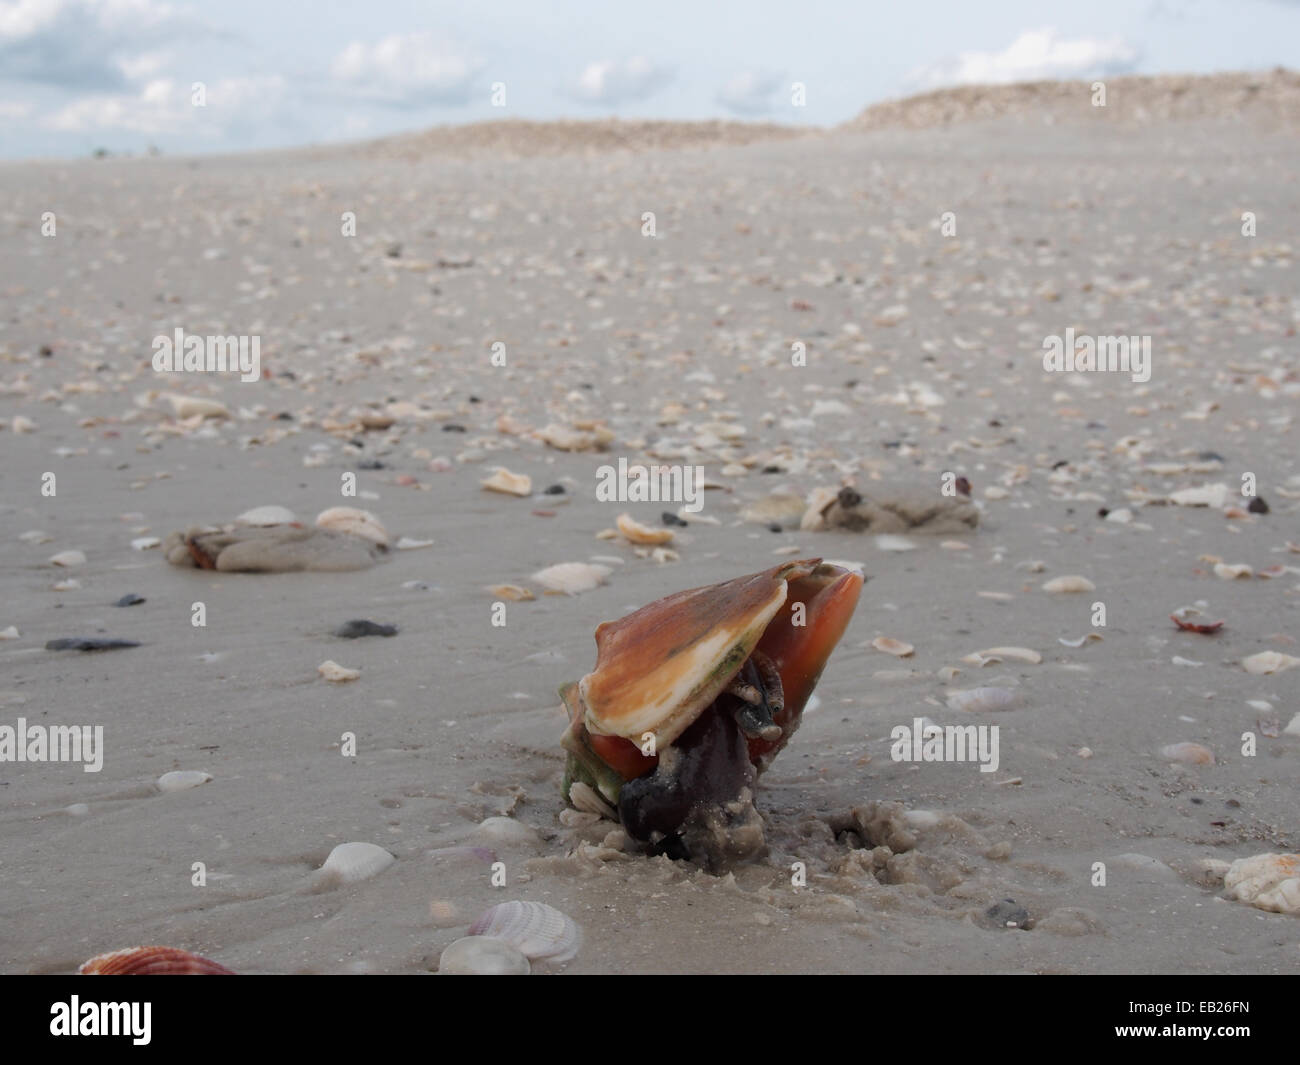 Ein live kämpfen Muschel kriecht entlang des Strandes im Lovers Key State Park, ft. Myers, Florida, USA, 6. Oktober Stockfoto